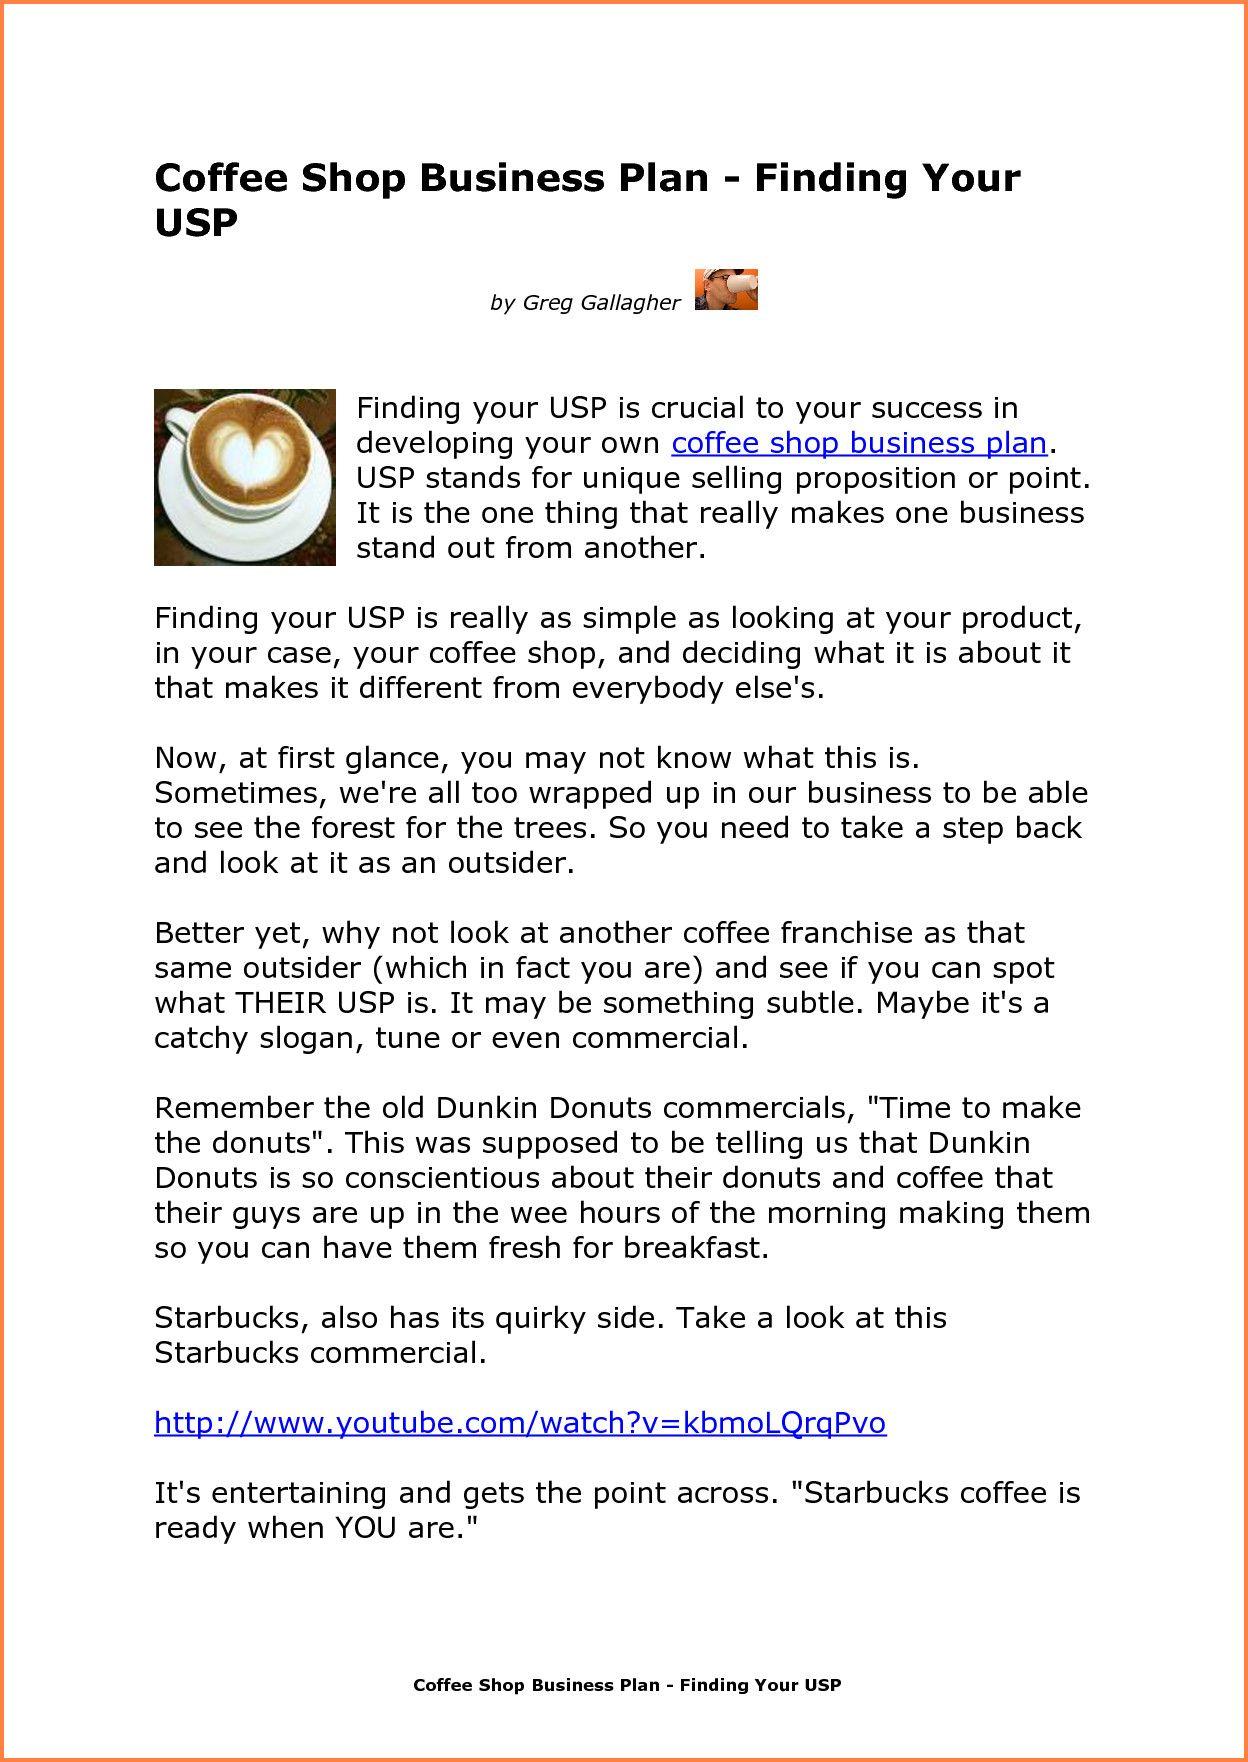 Cake shop business plan sample professional presentation ghostwriting website uk